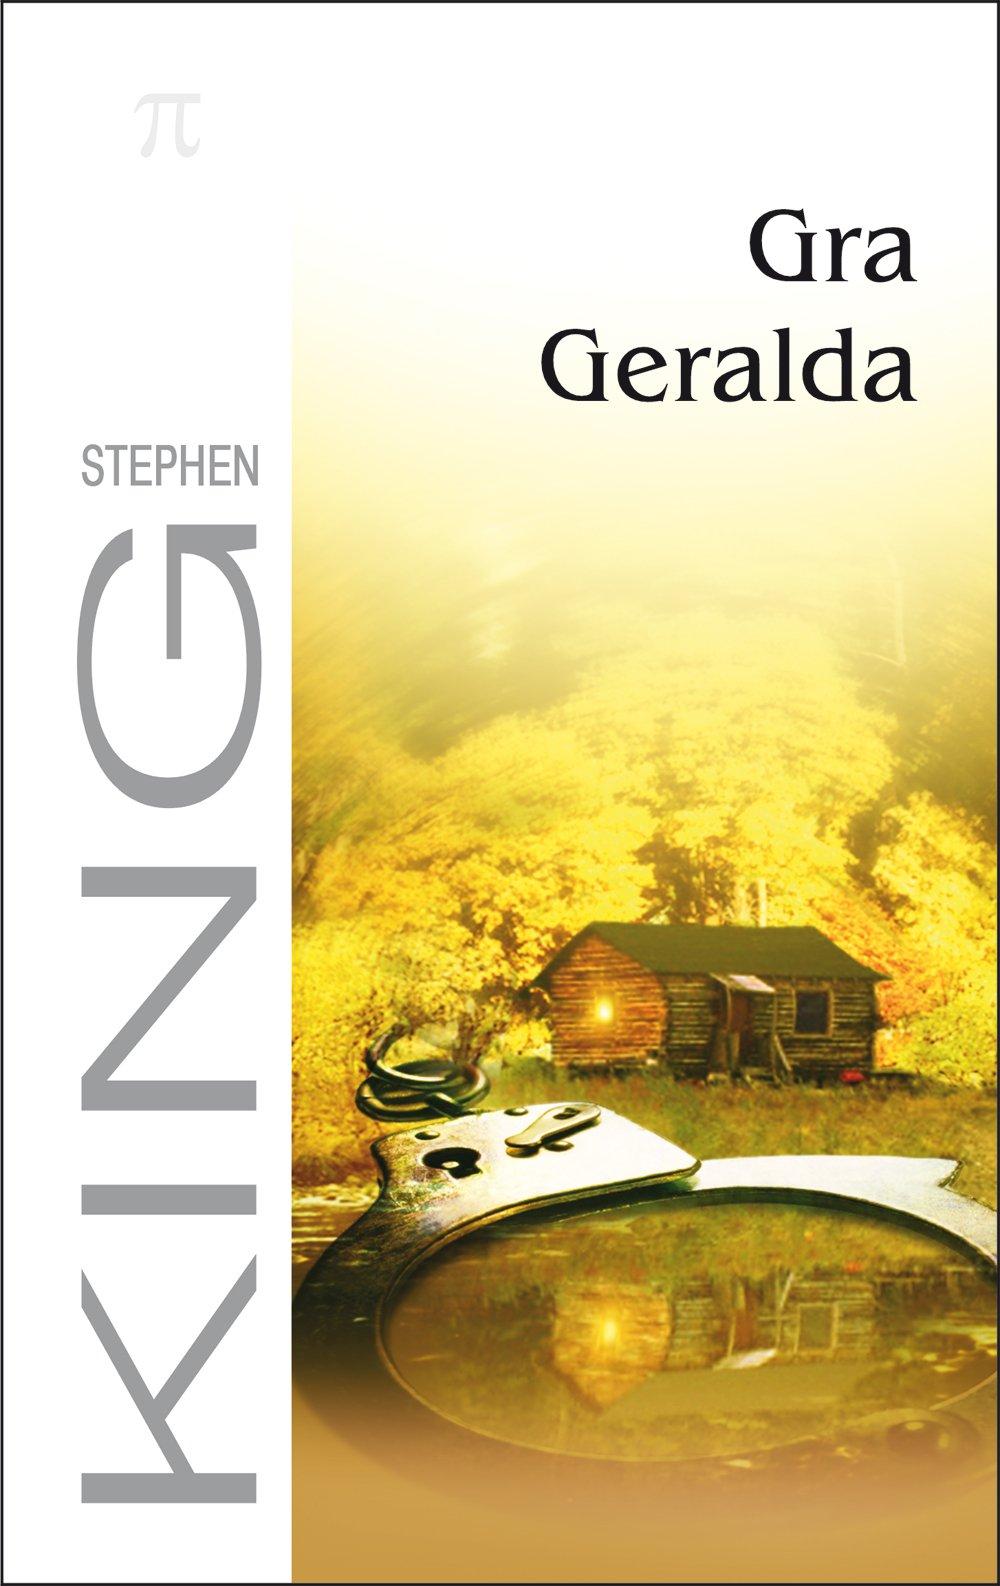 Gra Geralda - Ebook (Książka na Kindle) do pobrania w formacie MOBI